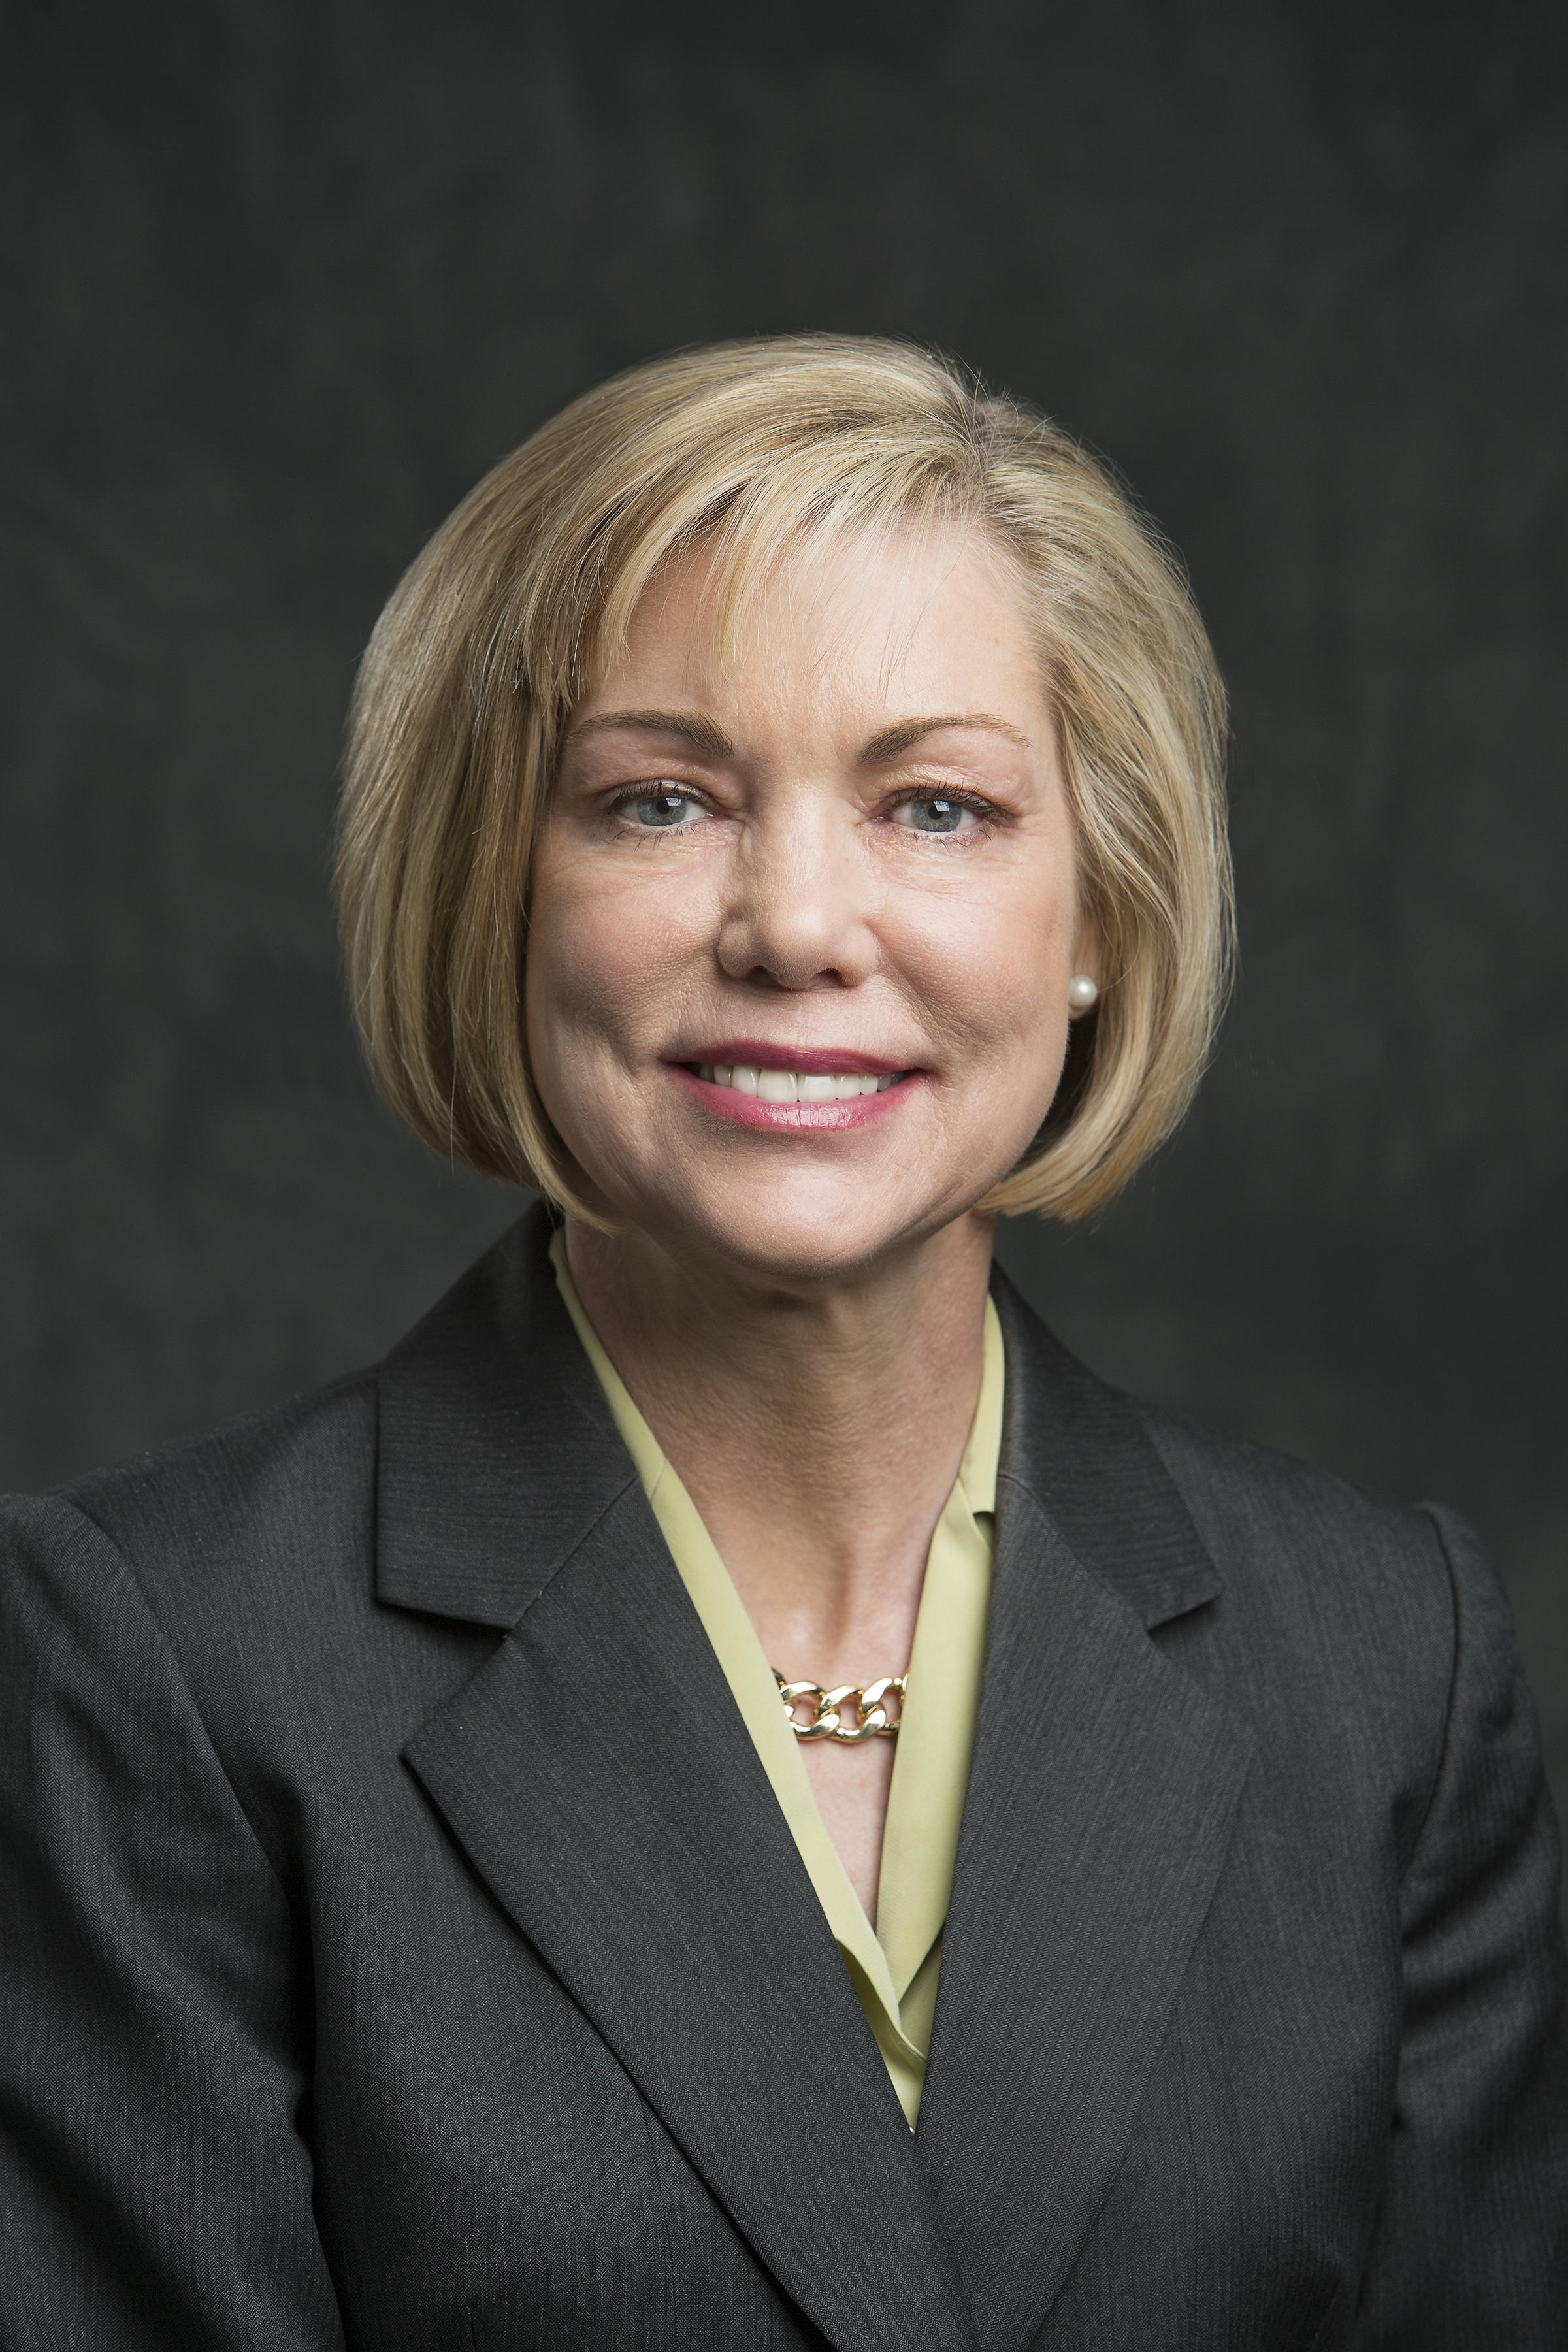 Engility CEO Lynn Dugle (Photo: Business Wire)